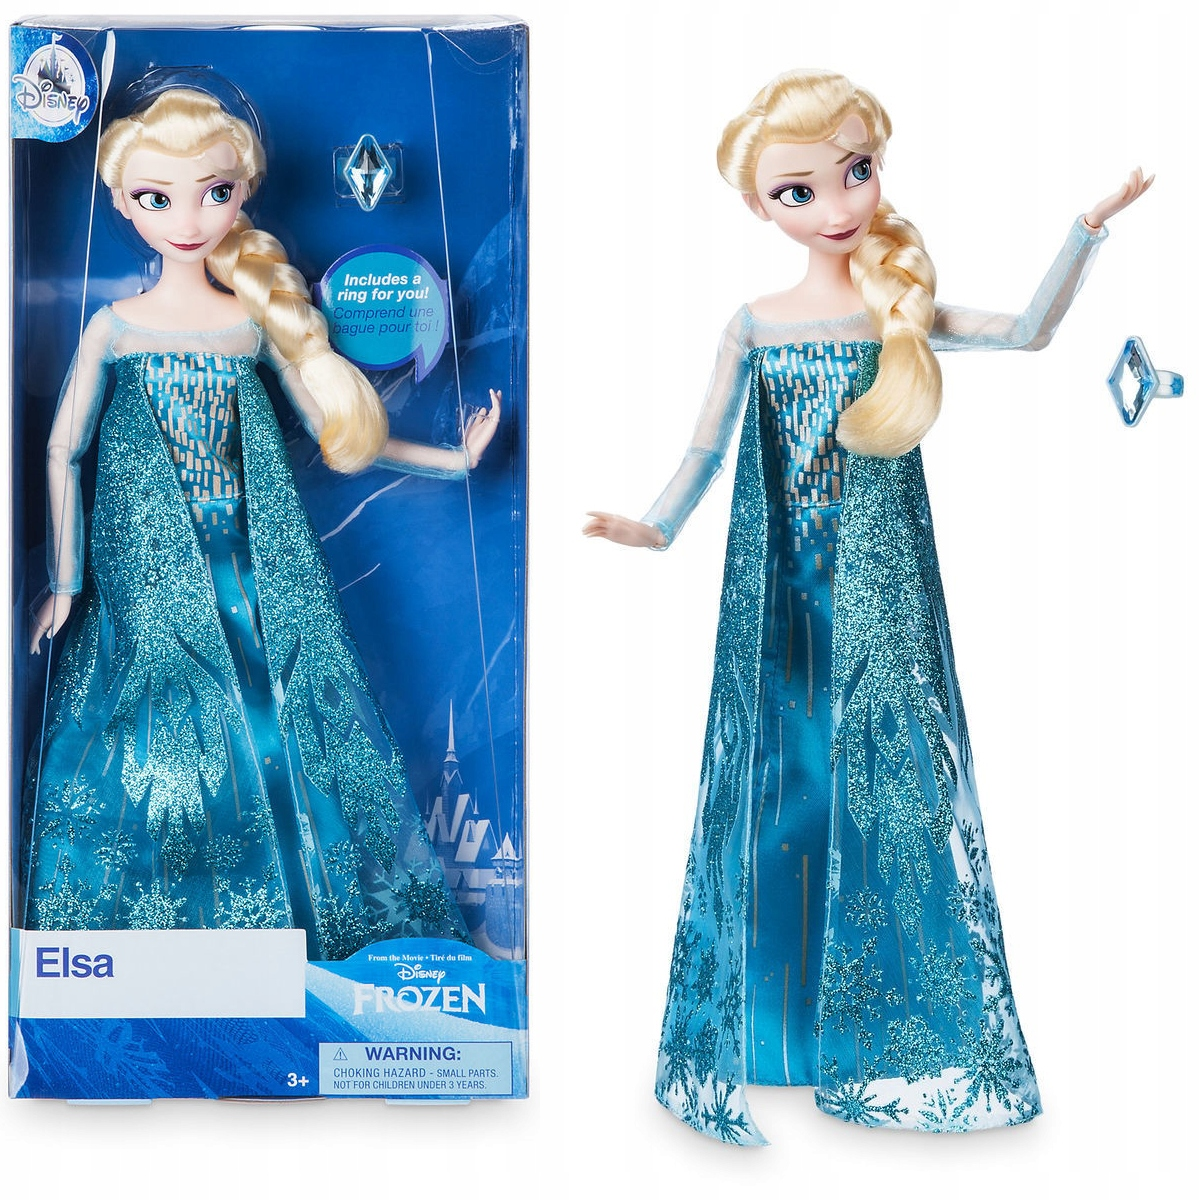 Elsa Frozen Kraina lodu 2018 Disney Pierścień 24h